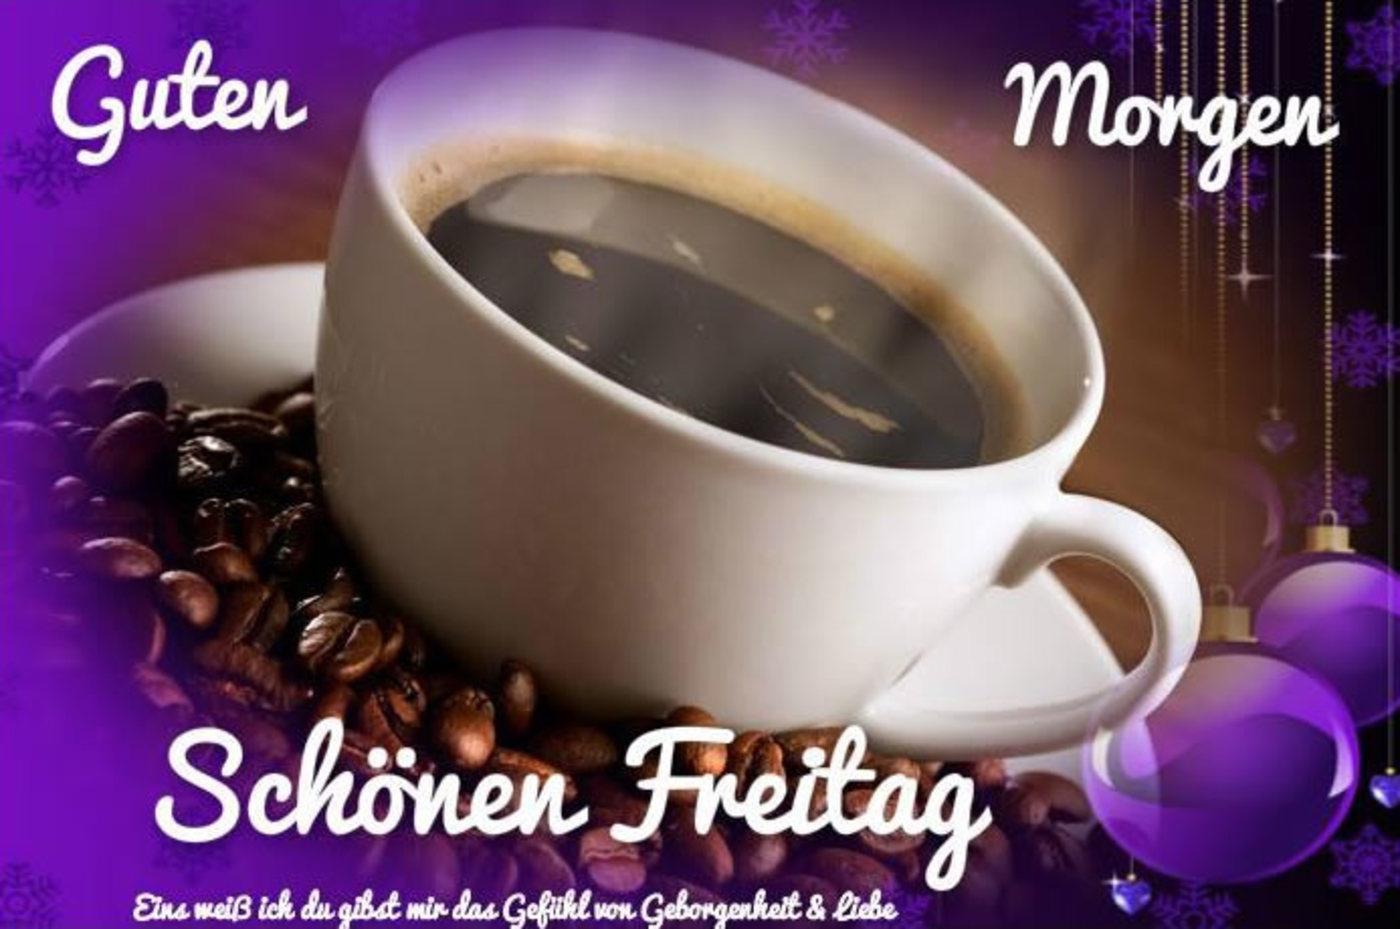 Schönen Freitag Kaffee 97 Gbpicsbildercom